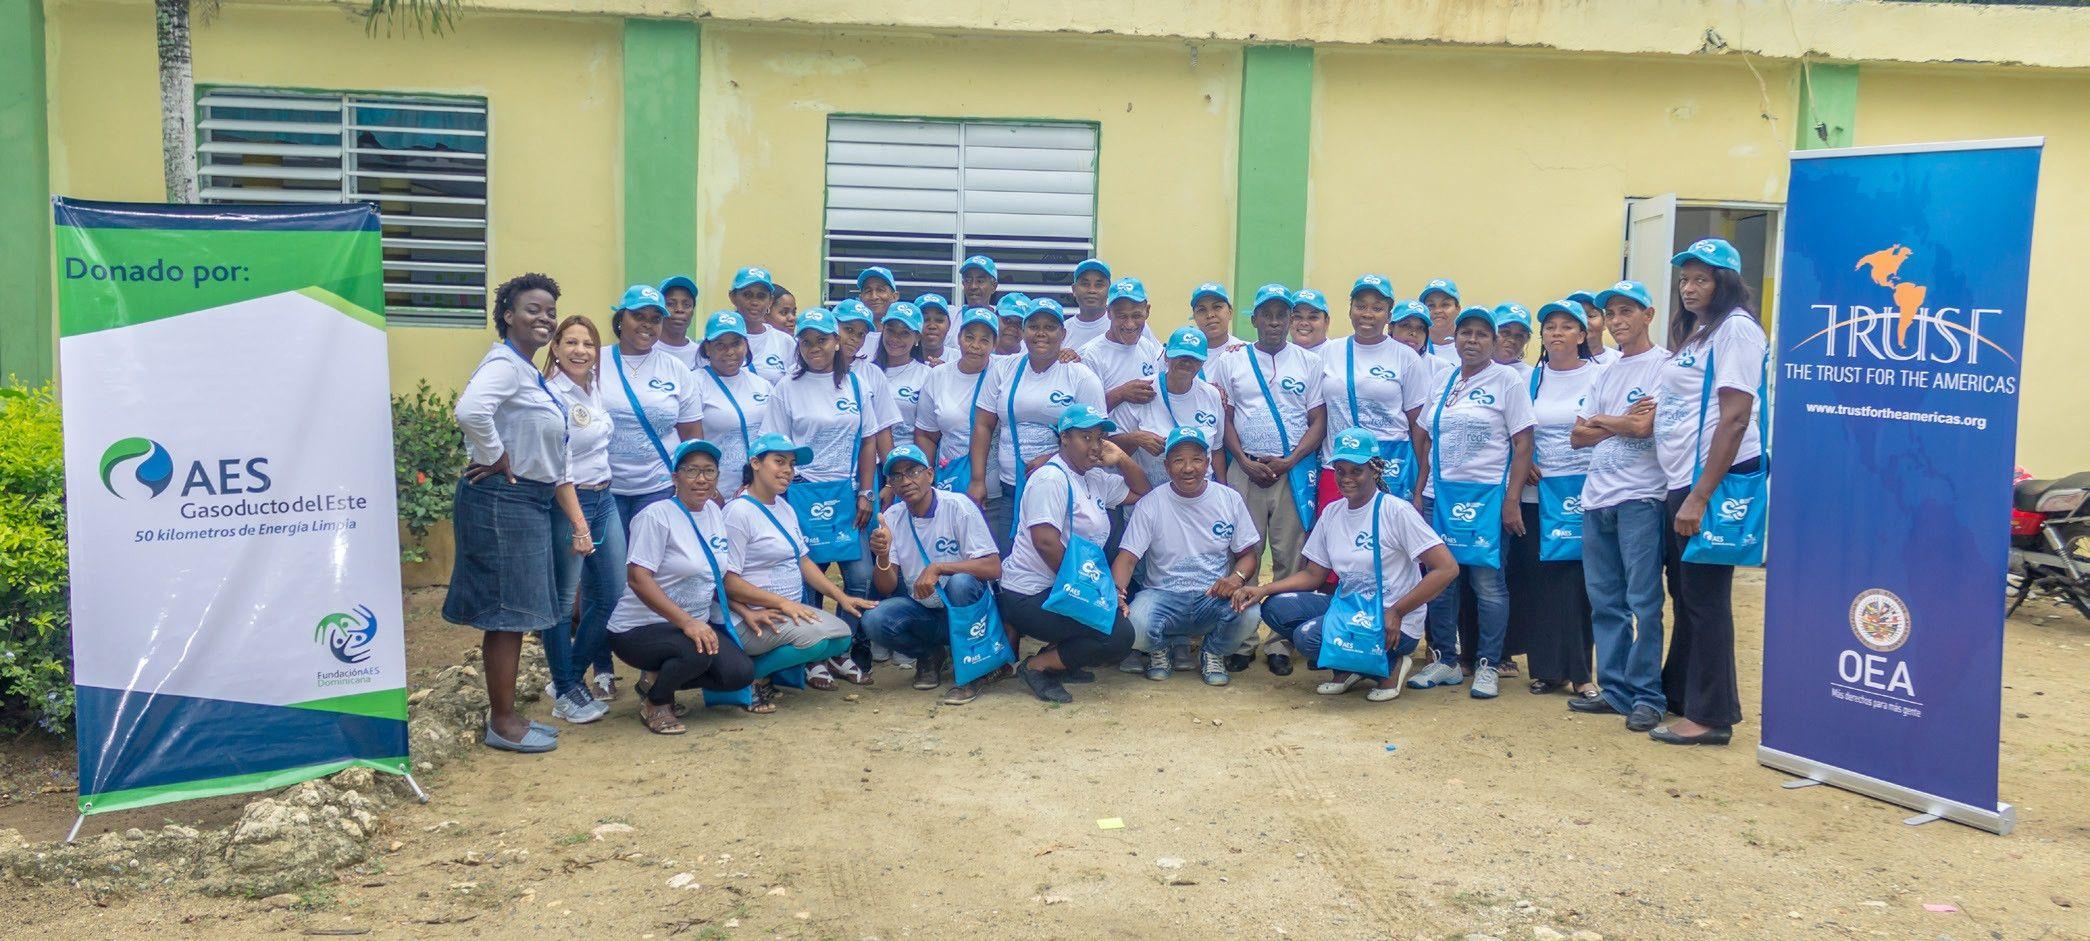 Fundación AES Dominicana y The Trust for the Americas impulsan a emprendedores